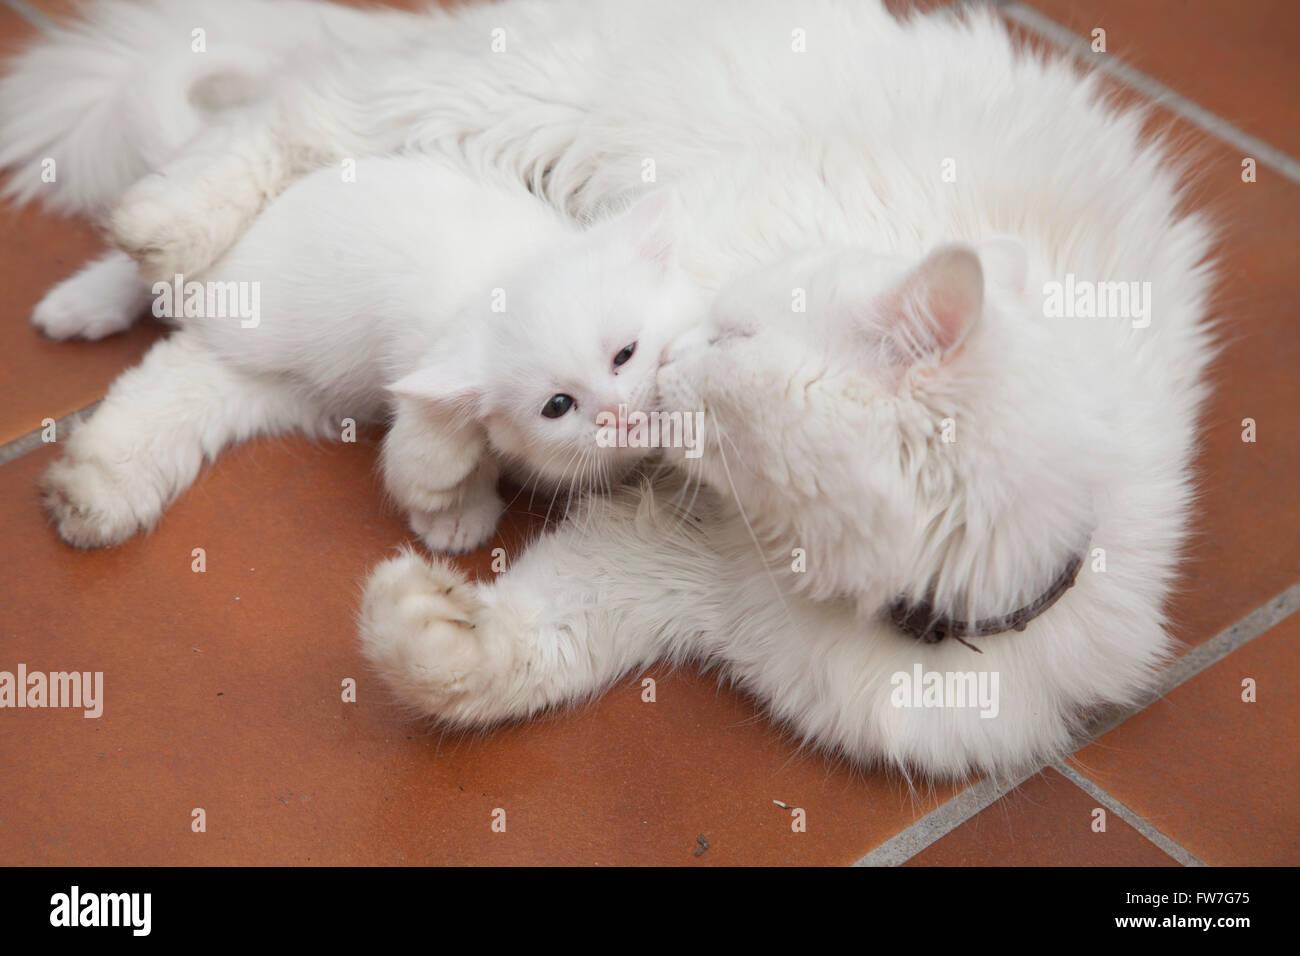 Cat, animal, domestic, tender, sweet, relaxing Stock Photo